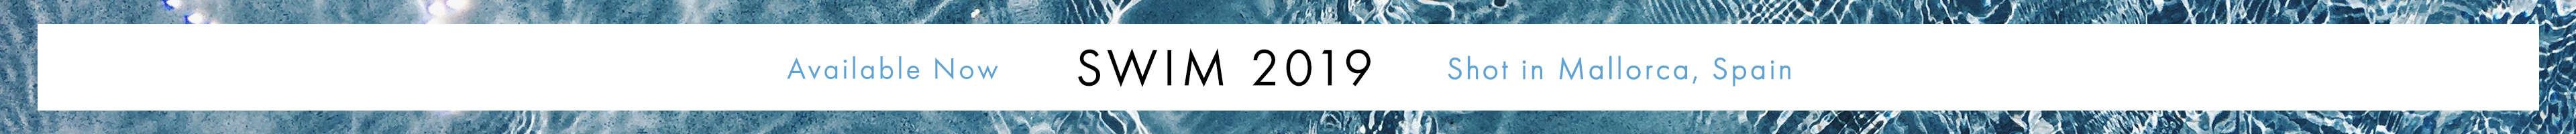 2019 Swim Lookbook & Campaign